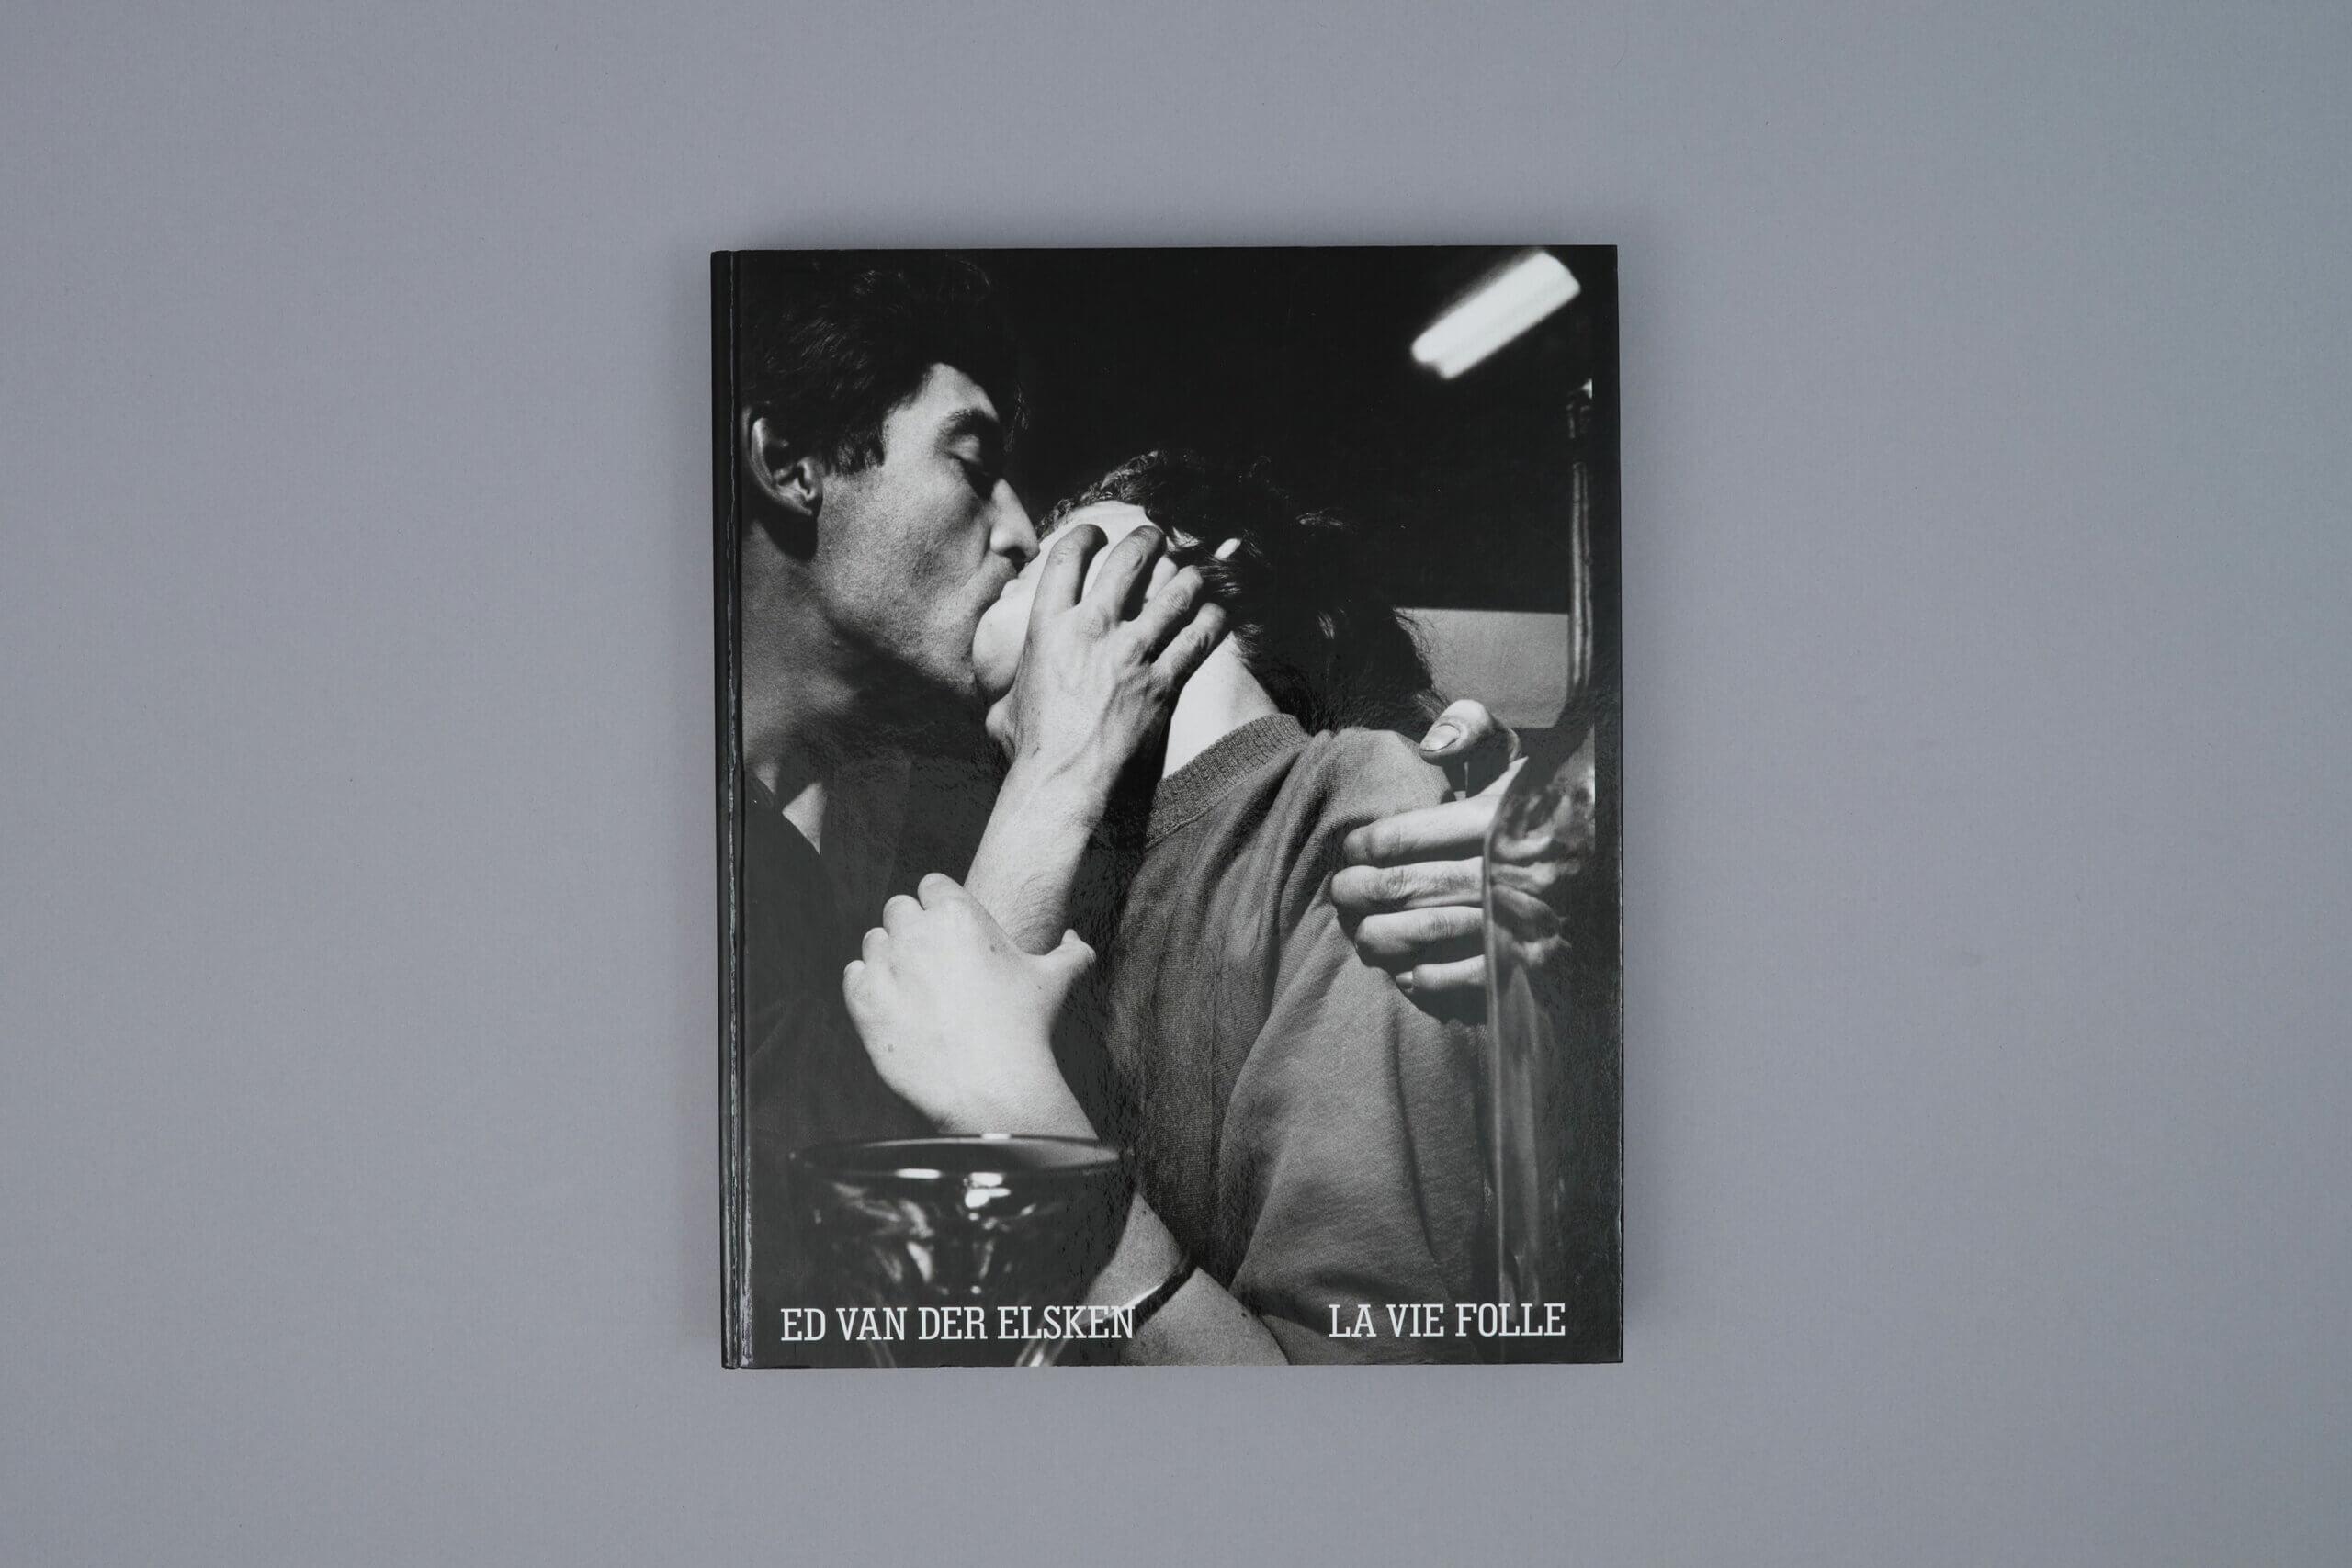 laviefolle-ed-van-der-elsken-cover